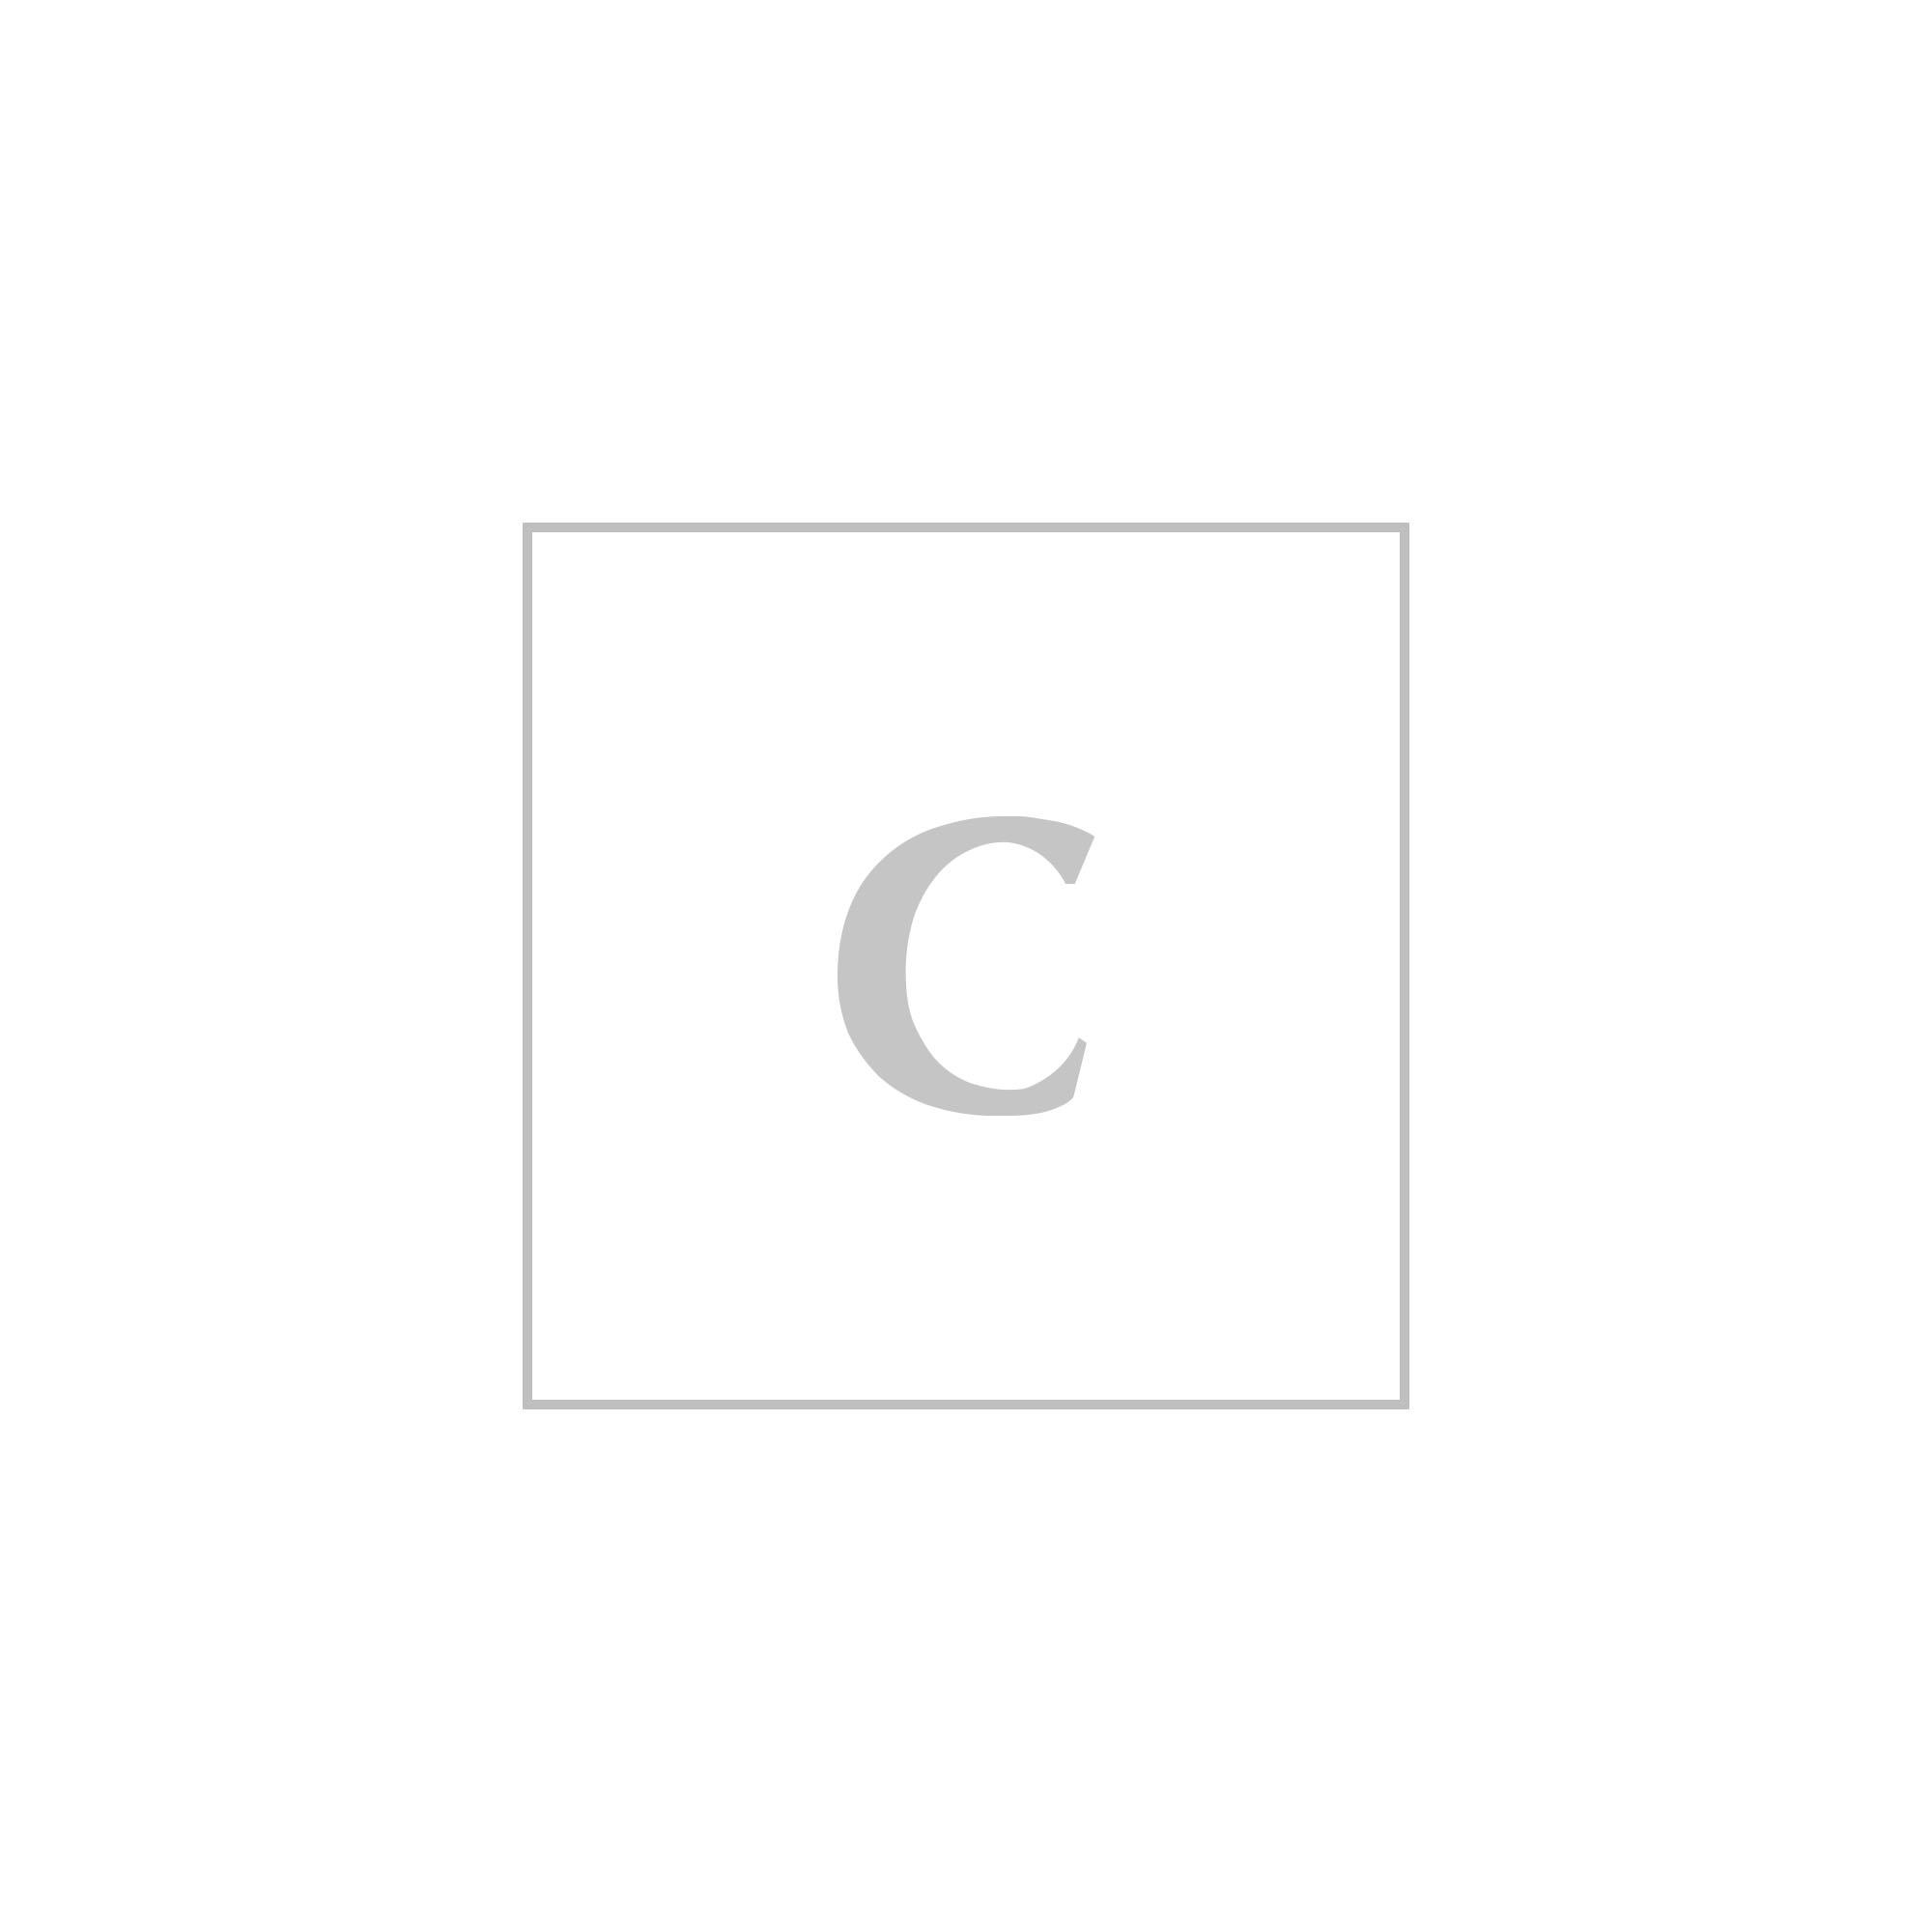 new product 56634 bb5c0 cappotti fendi grigio 172405uca000001-f0ty6-8.jpg